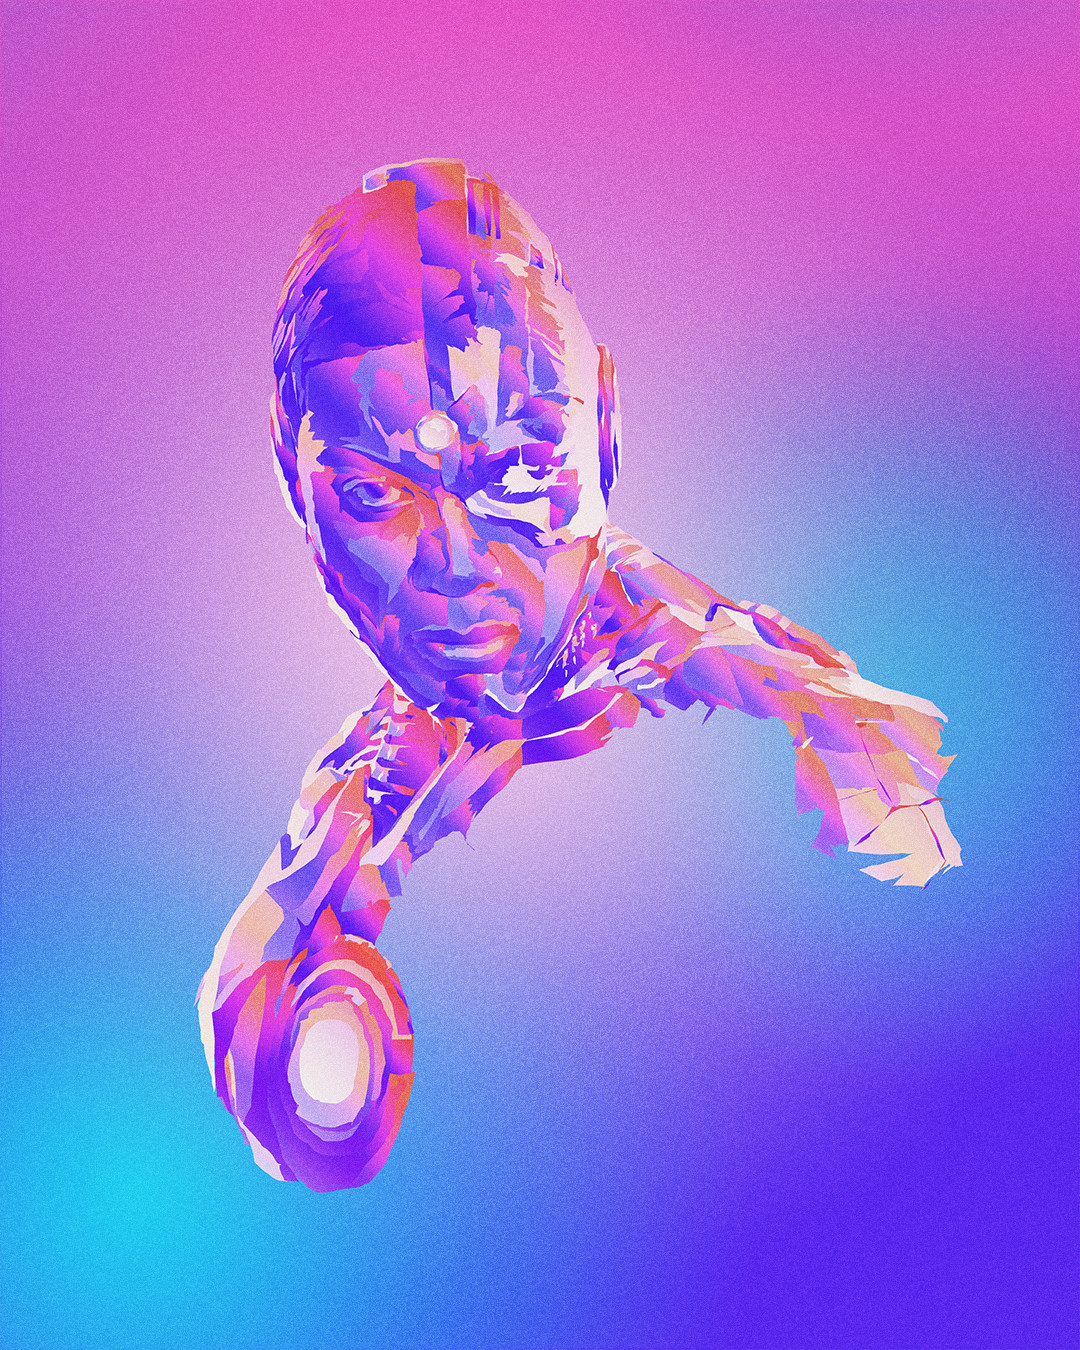 Nick tam full masaolab justiceleague colorillustration cyborg v1